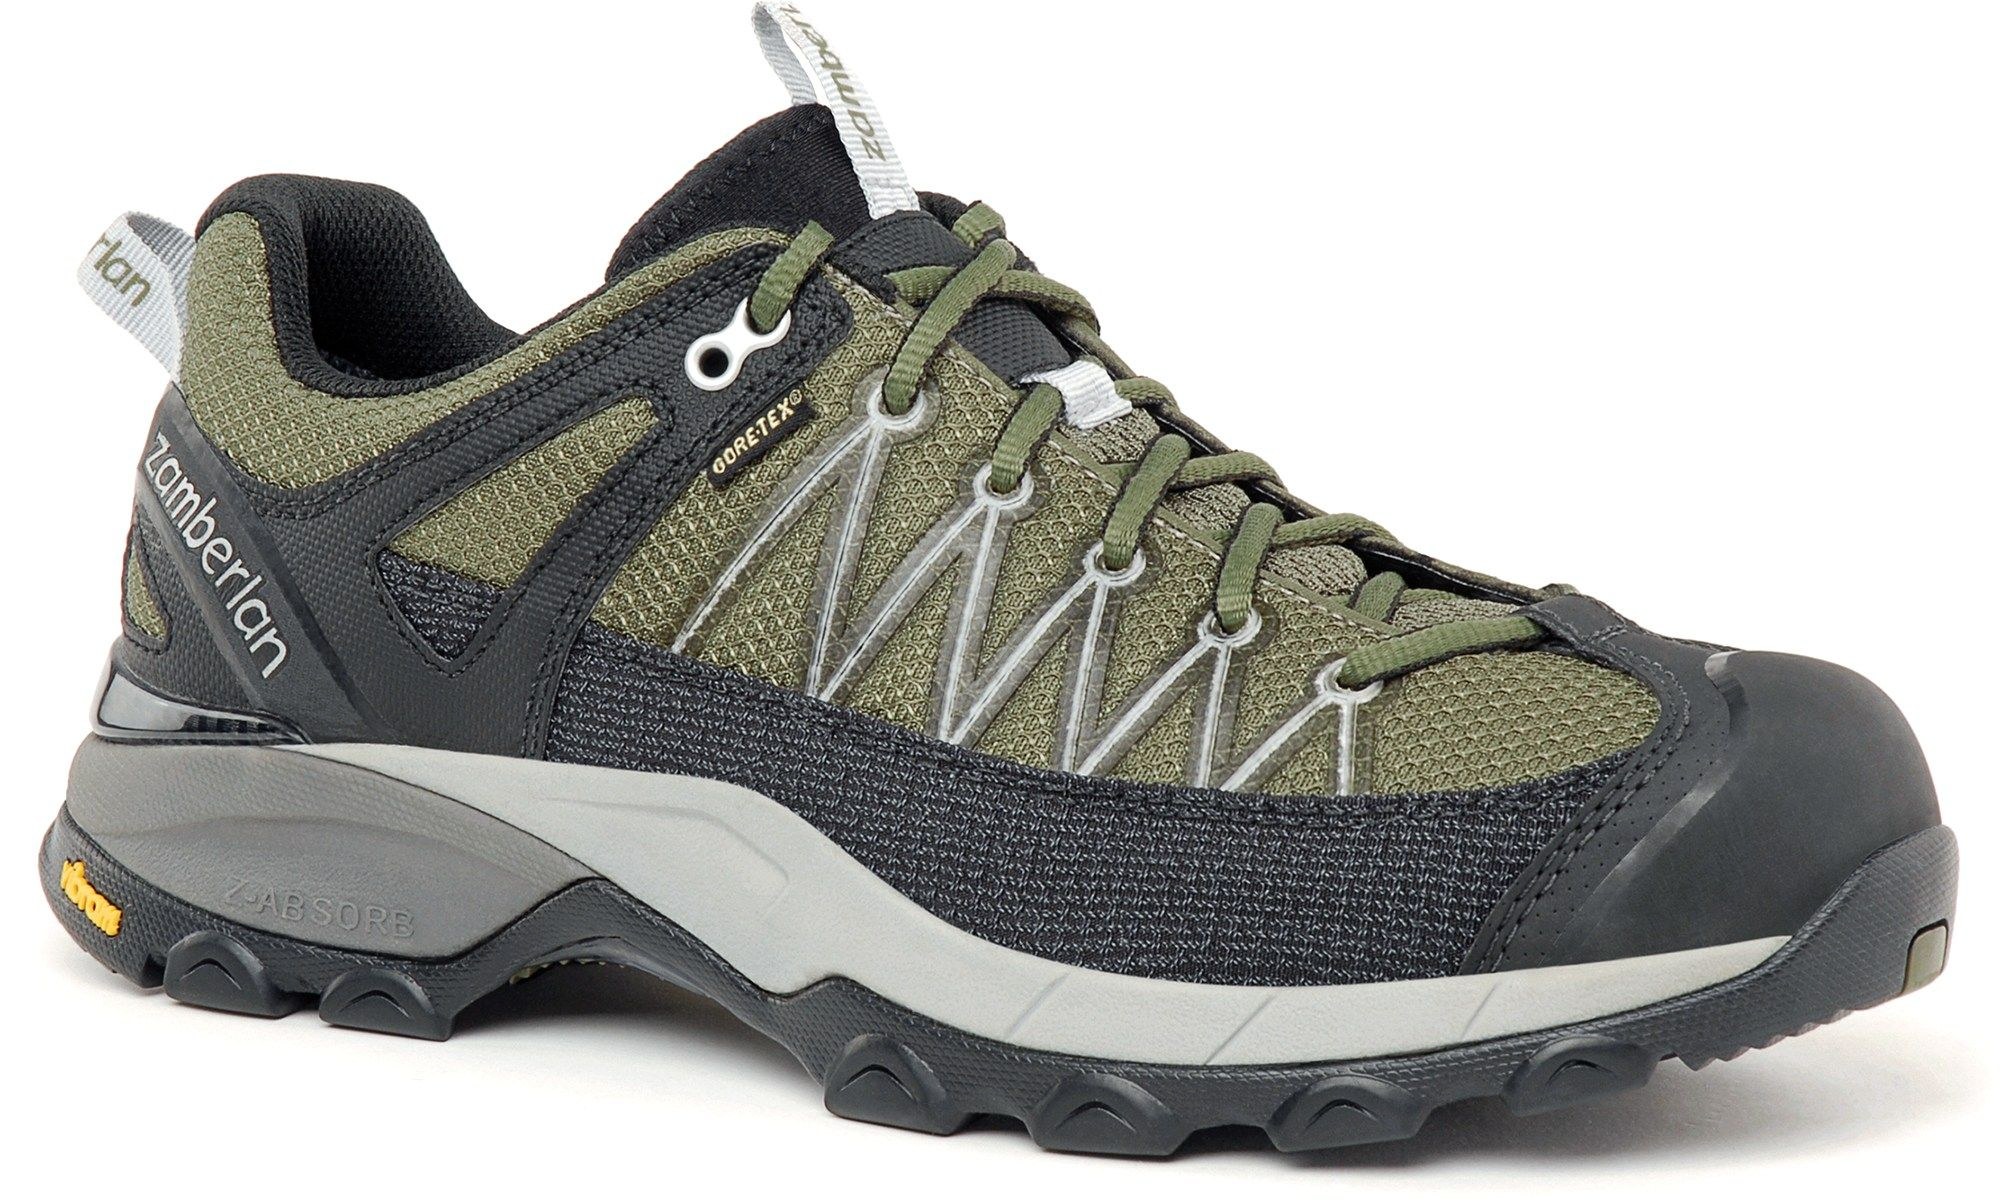 Zamberlan 130 Sh Crosser Gtx Rr Low Hiking Boots Men S 2014 Closeout Hiking Boots Boots Boots Men